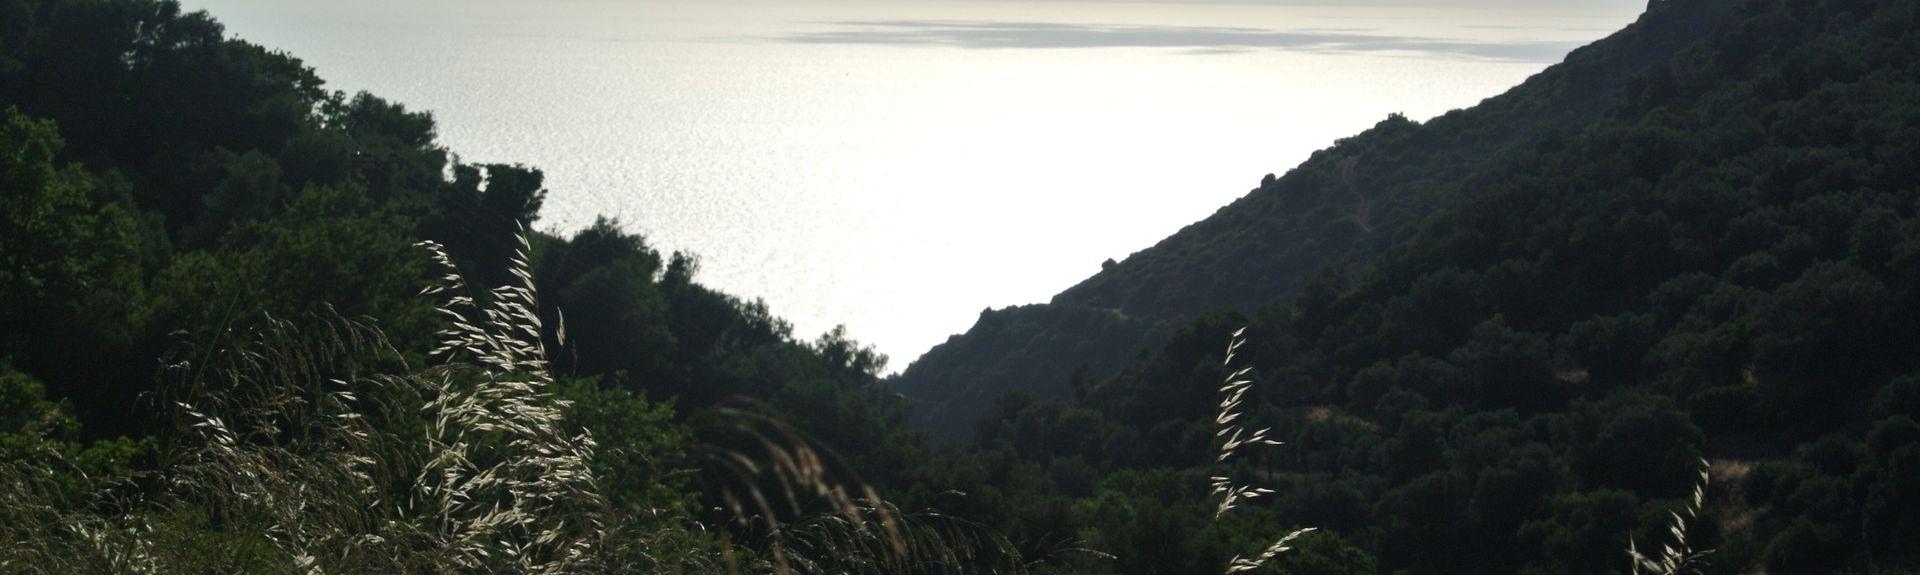 Elafonisi, Pelekanos, Kreta, Griechenland